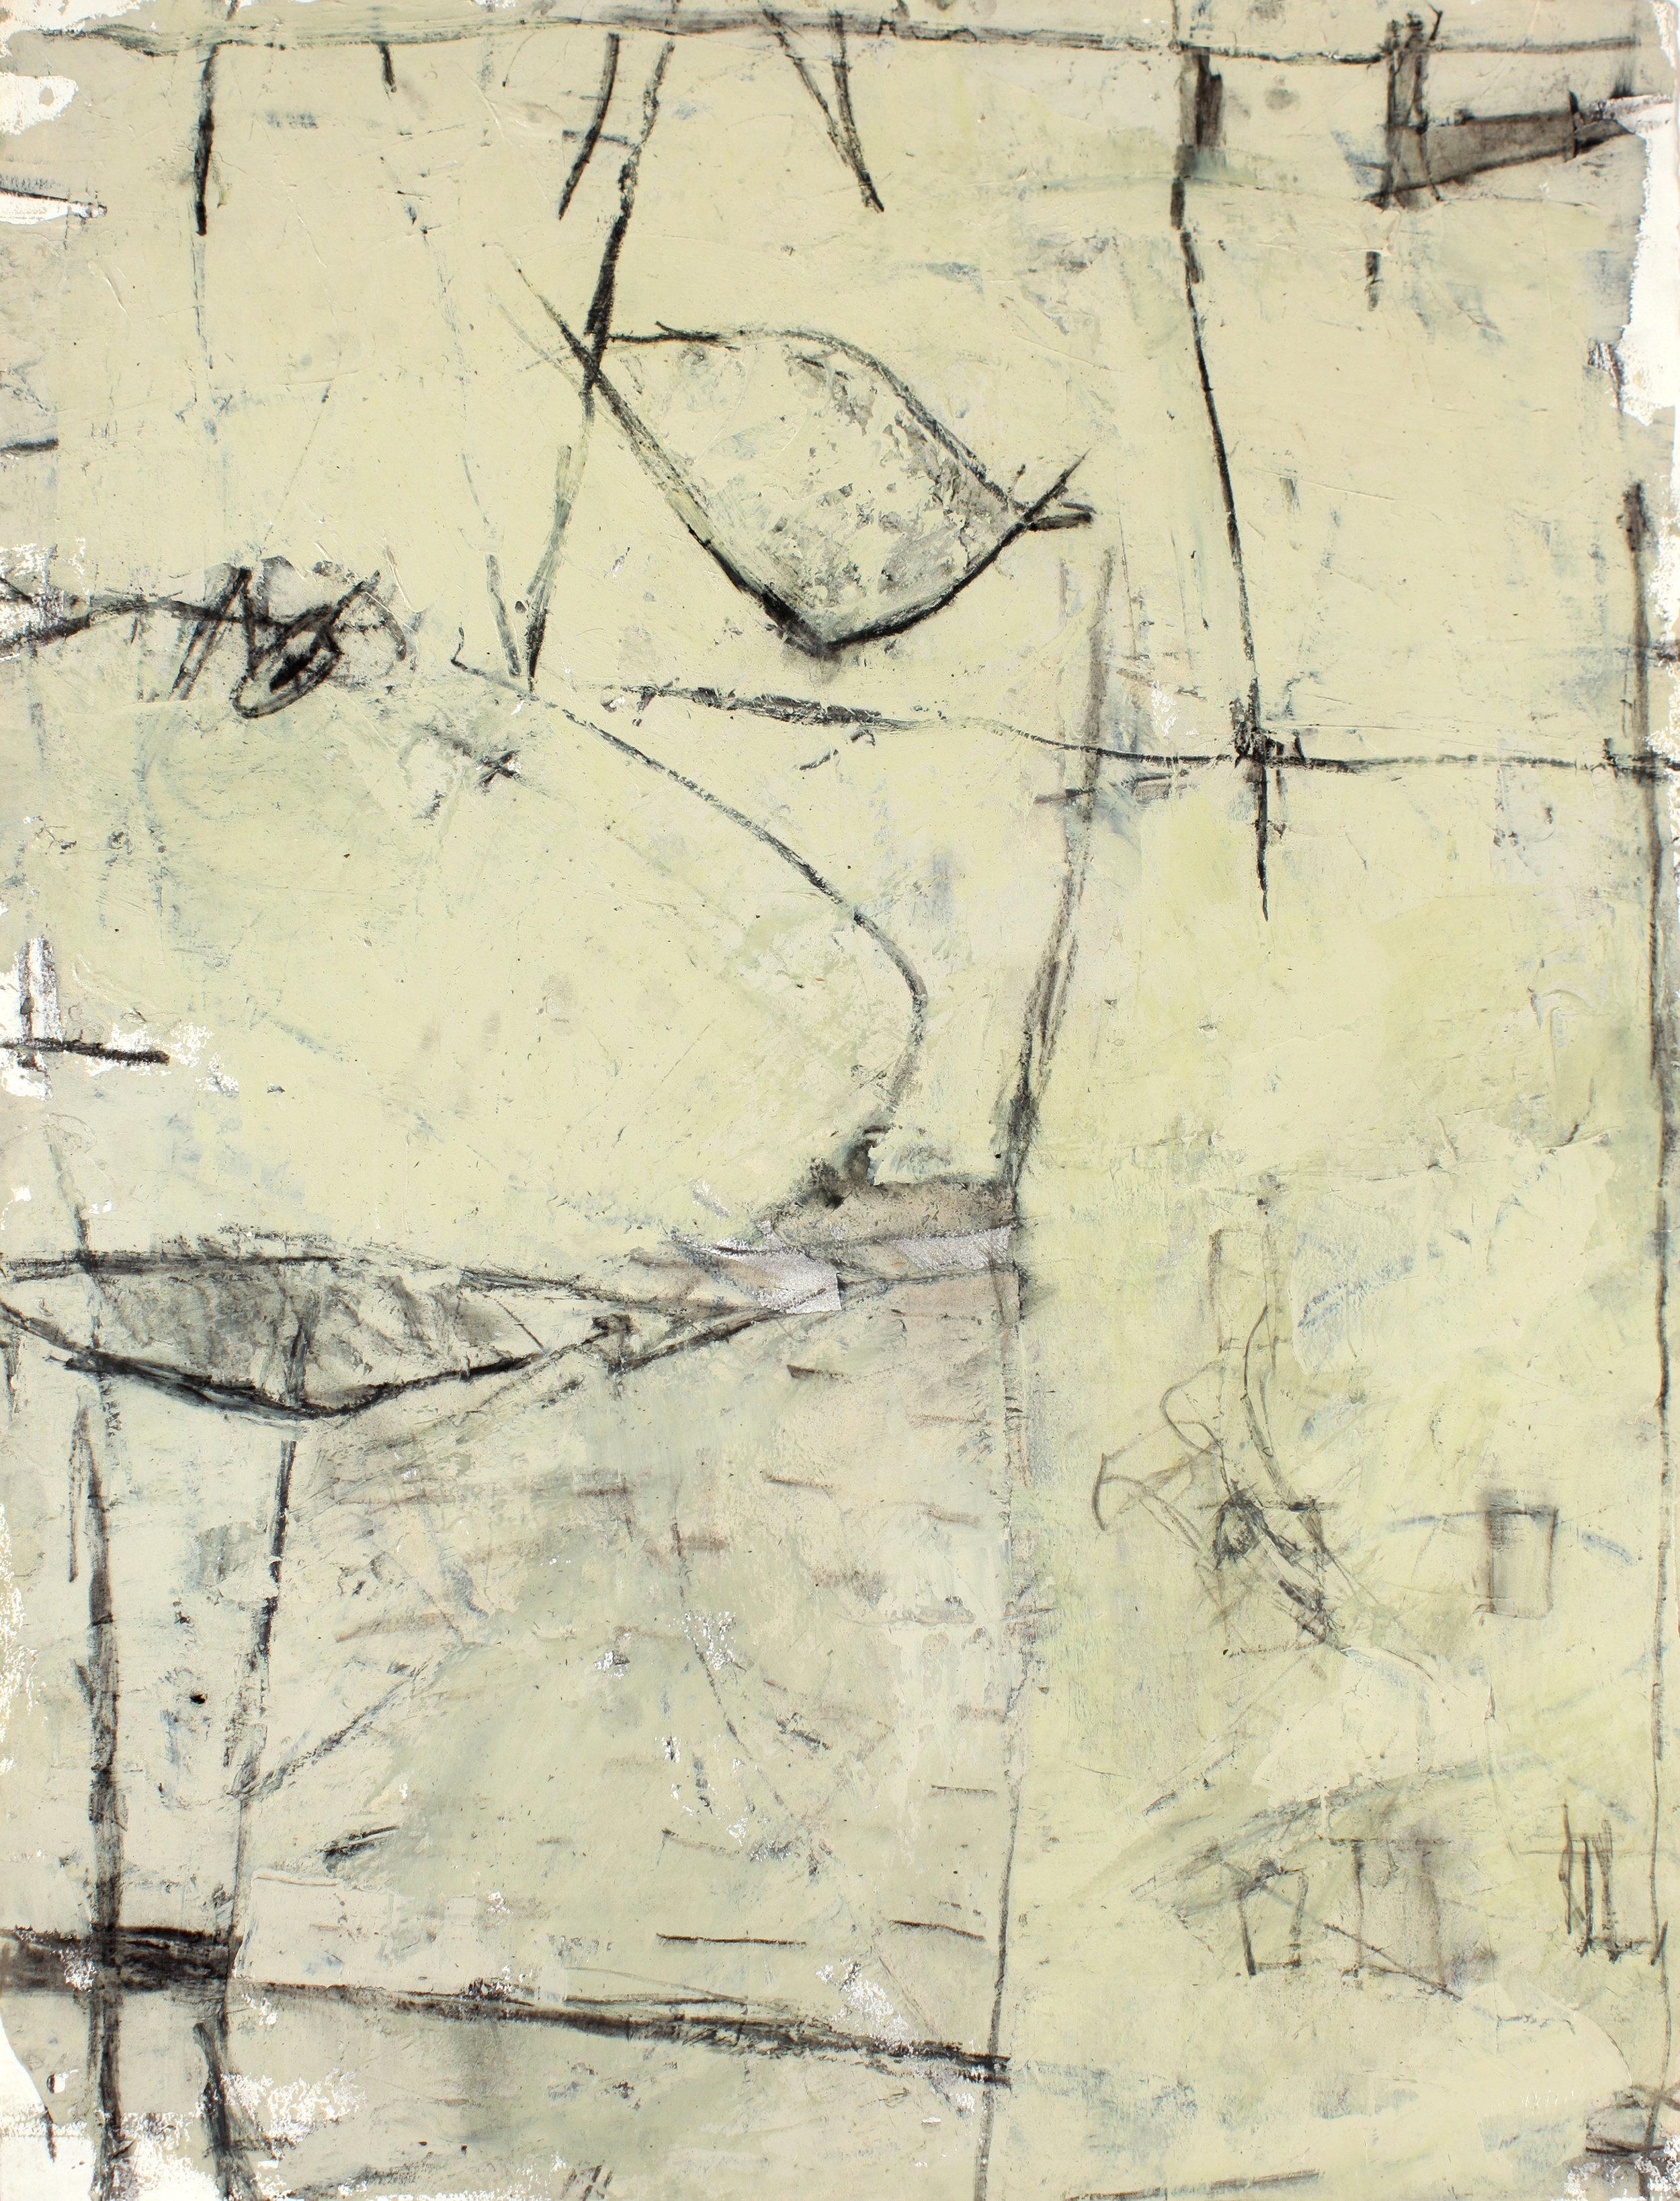 1983_UntitledNo8302_acrylicandcharcoalonpaper_23X30_WPNF044.jpg